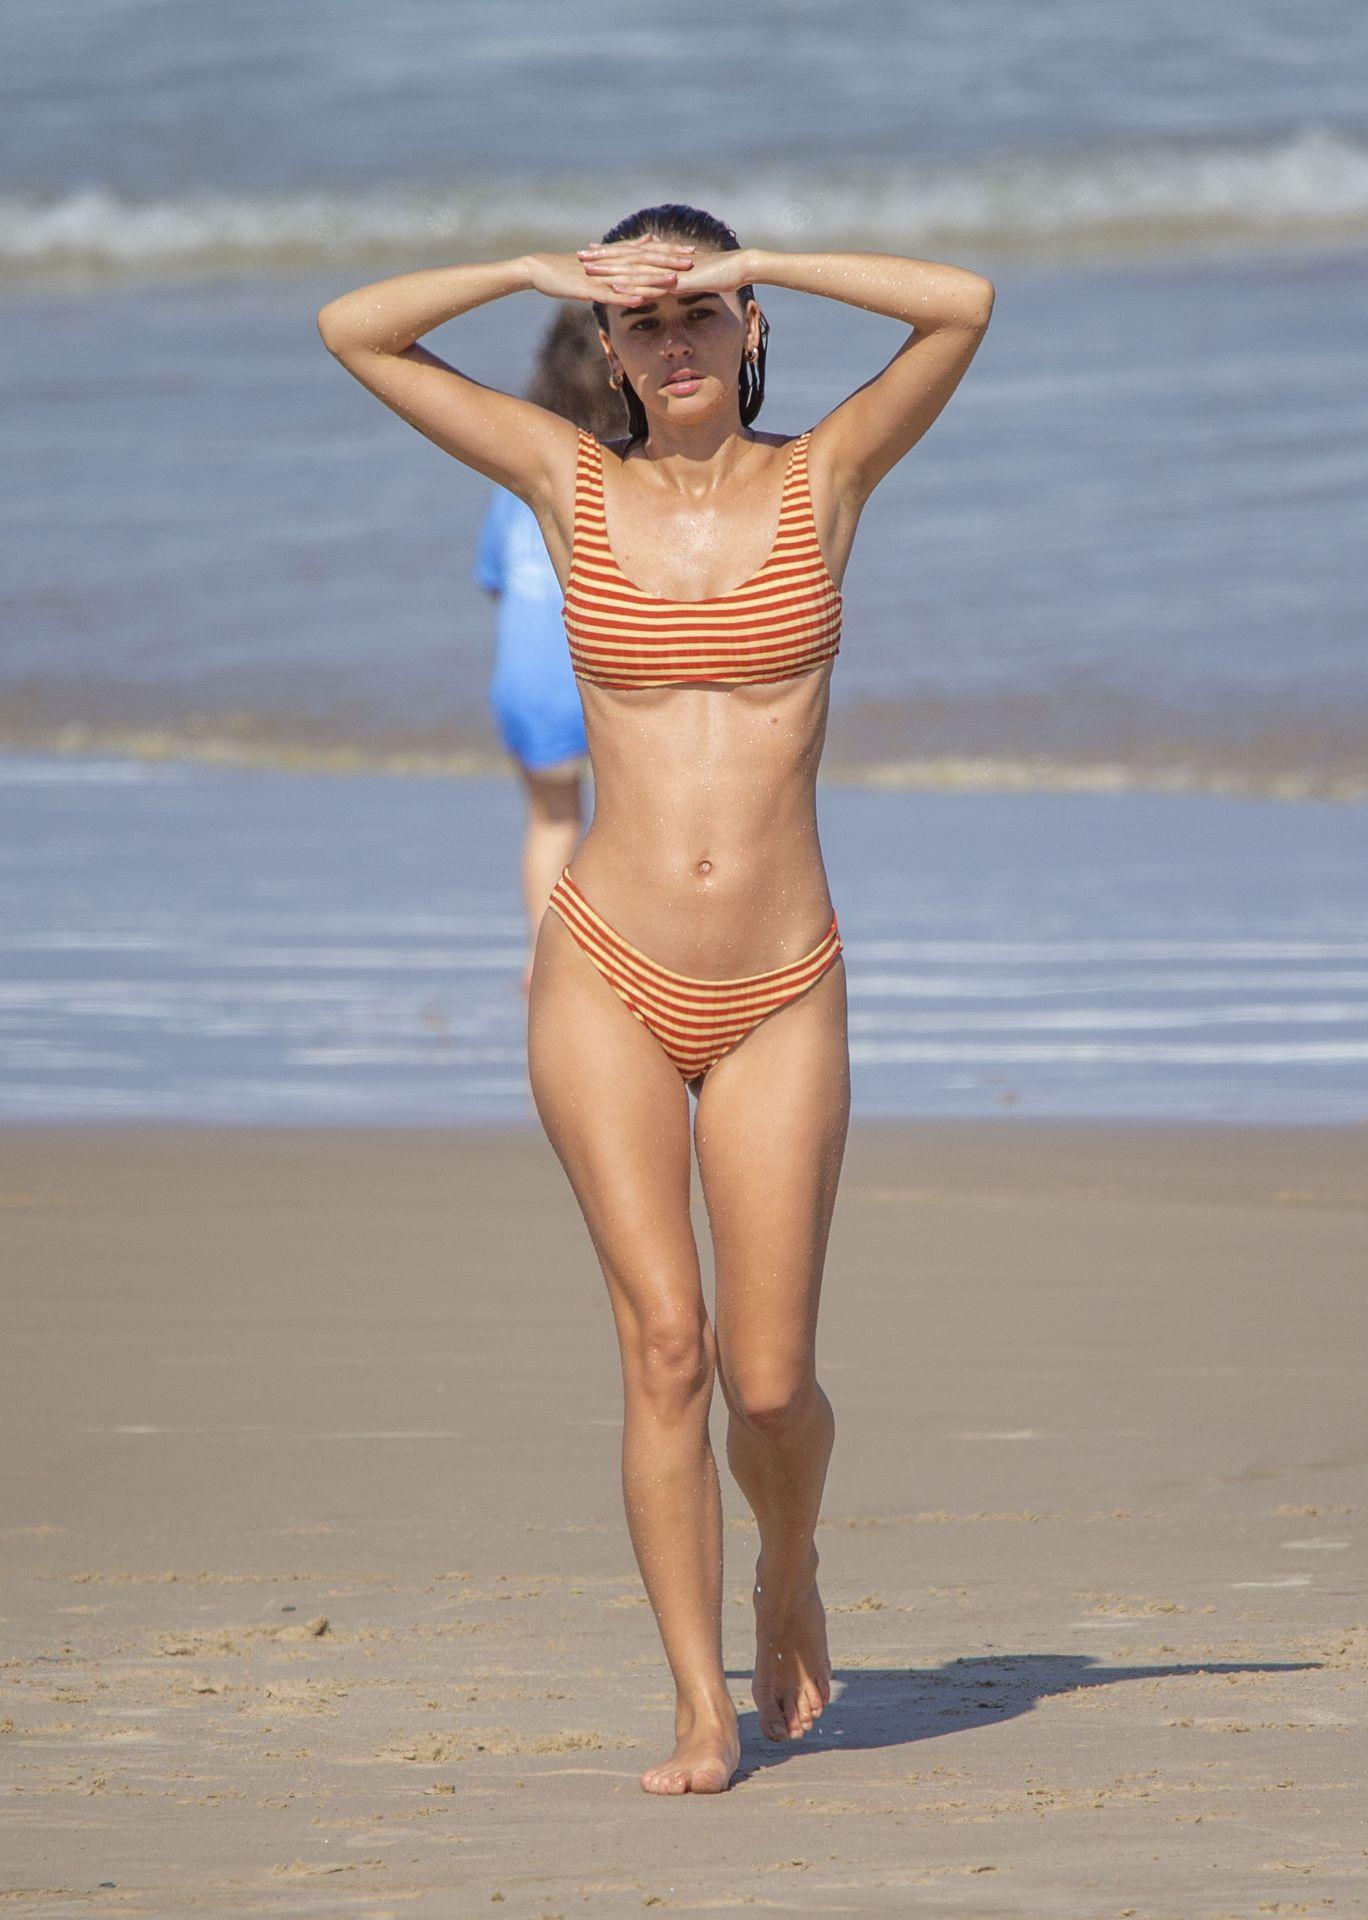 Gabriella Brooks Hot – Liam Hemsworth's New Girlfriend 0045